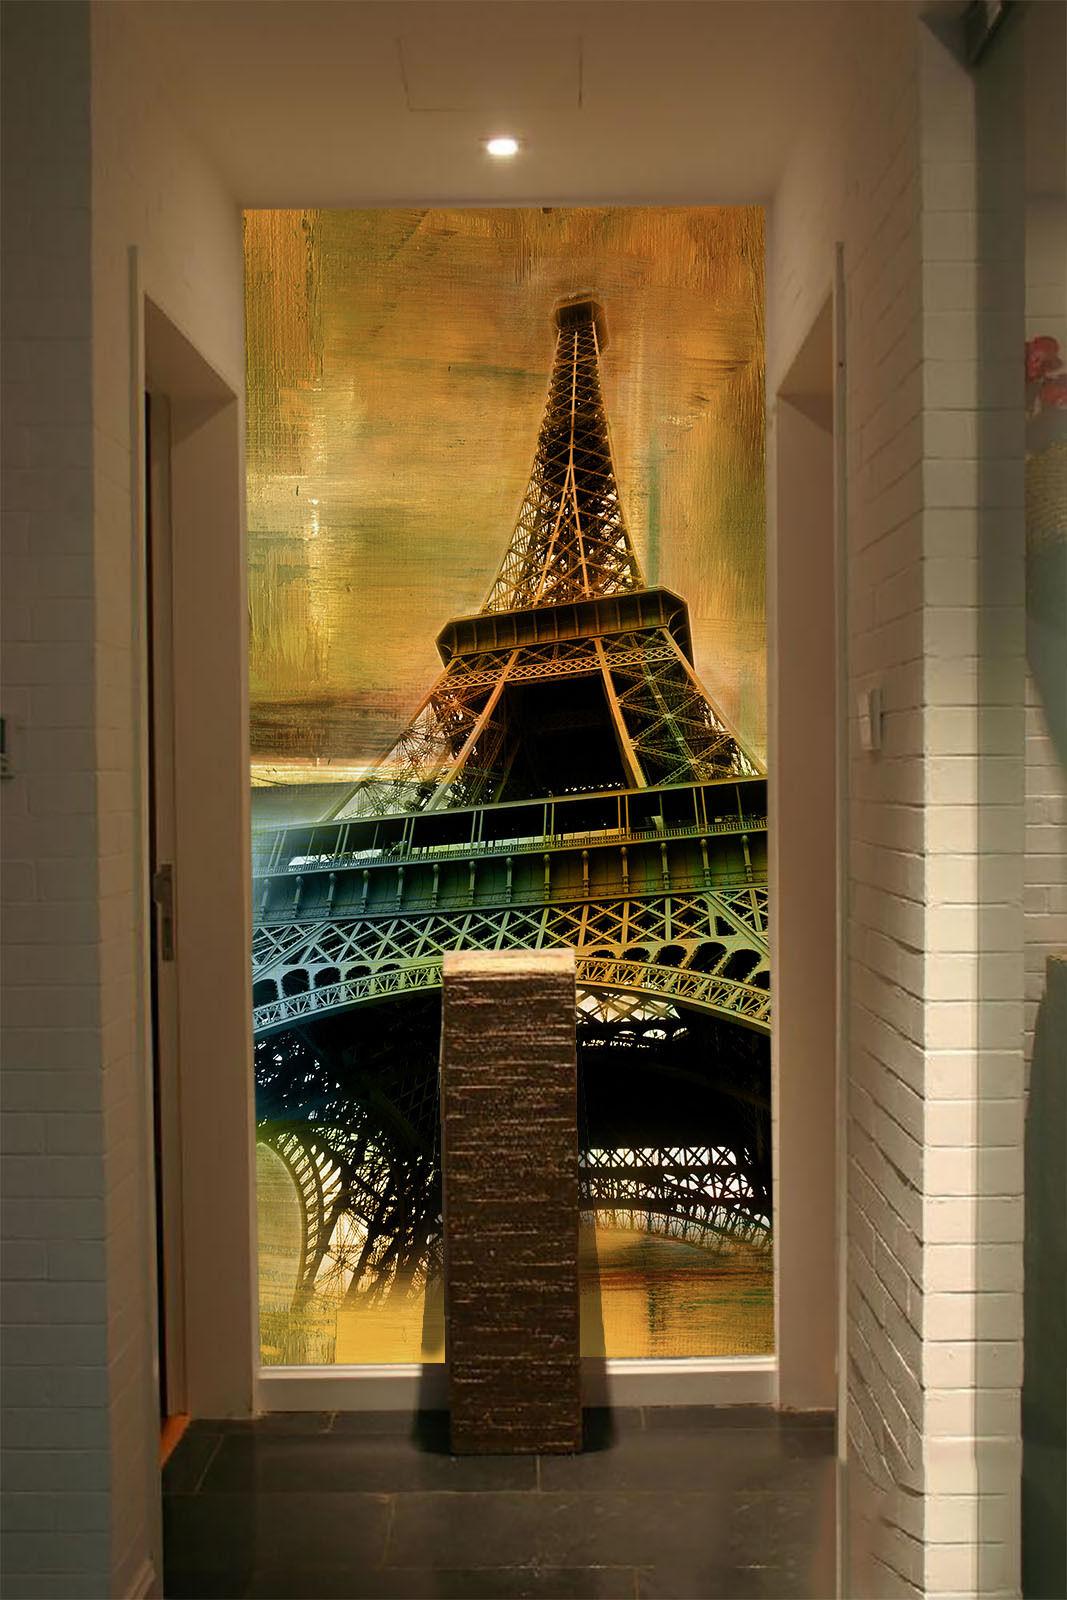 3D Trasmissione 3 Parete Murale FotoCarta da parati immagine sfondo muro stampa